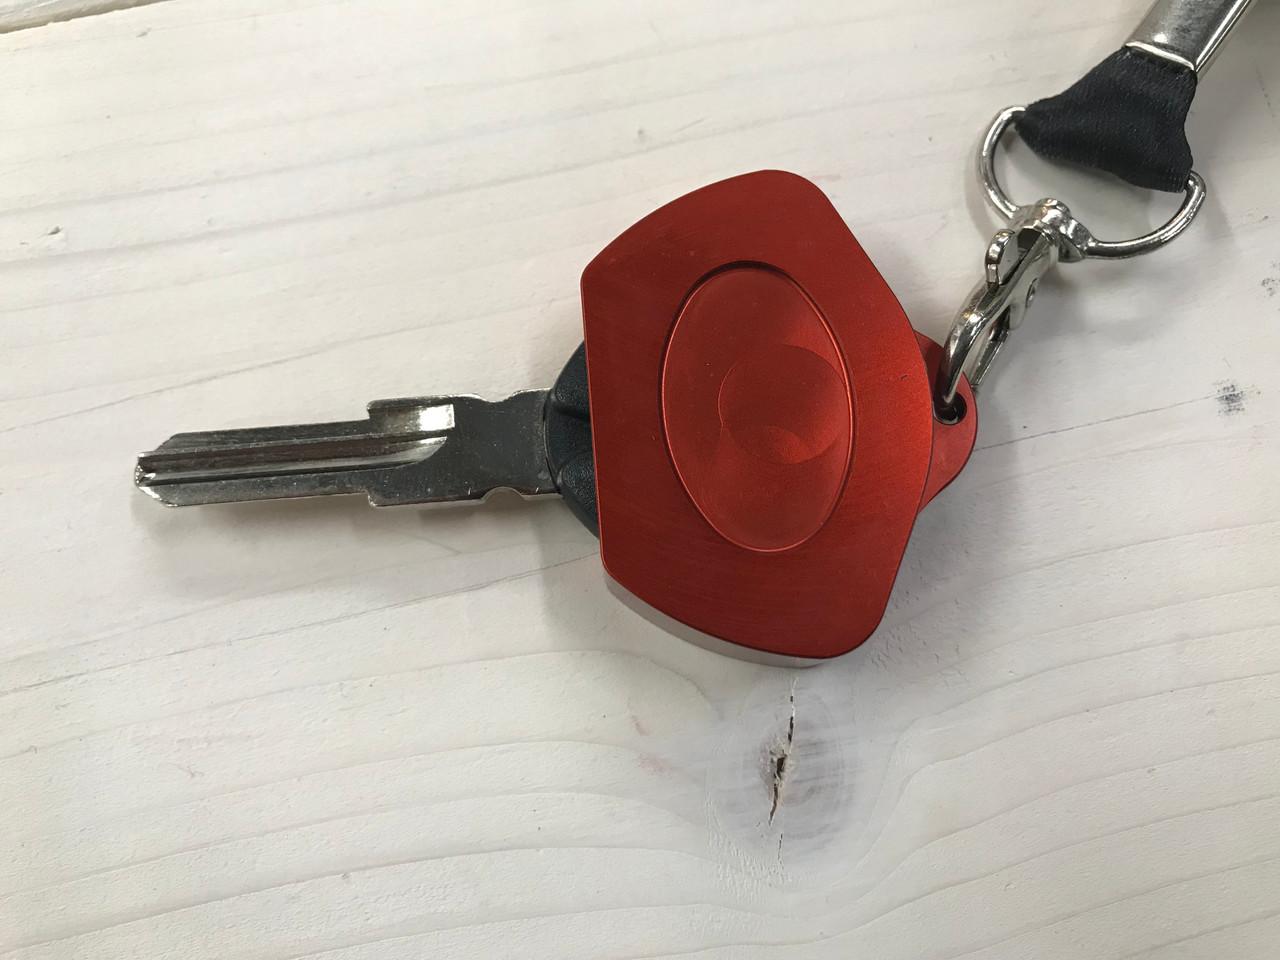 Spyder Ryder of America Edition - Spyder Key Holder